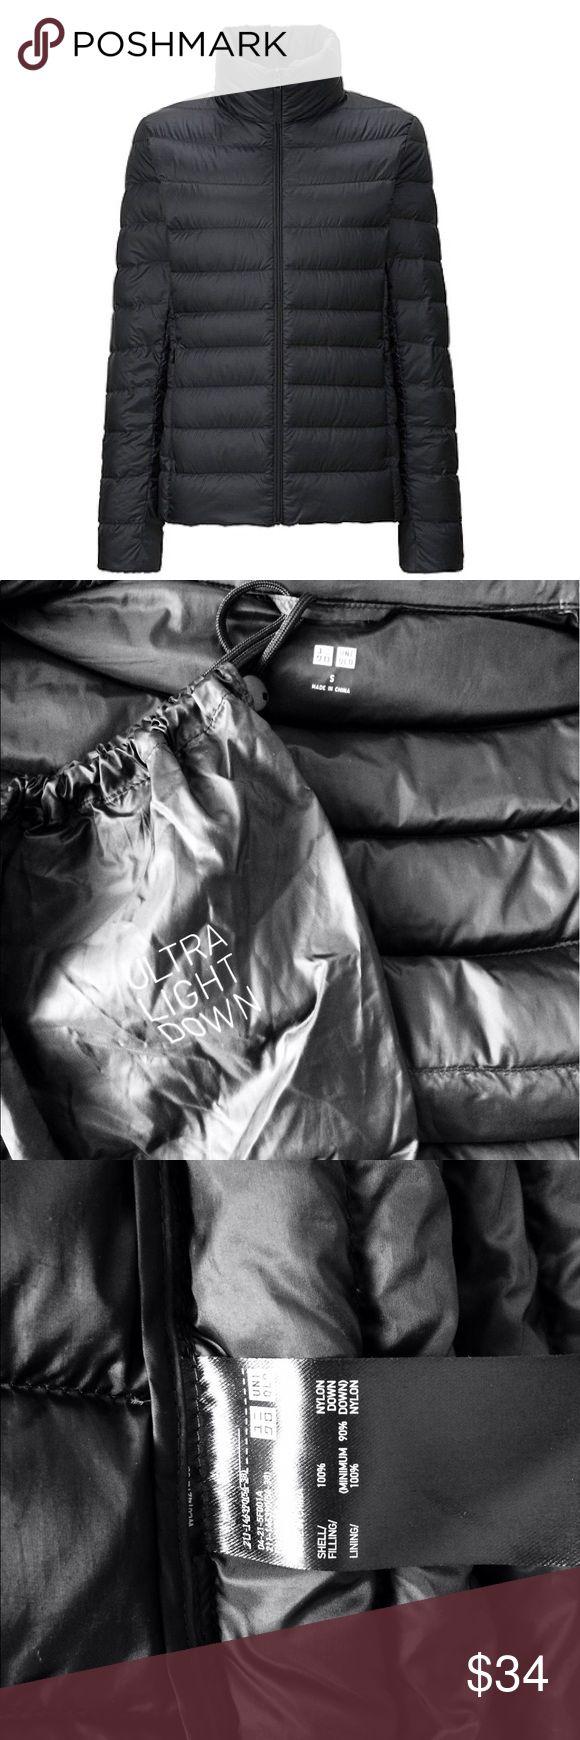 Uniqlo ultra light down jacket. Black. Small. Uniqlo ultra light down women's jacket. Black. Small. Lightly worn. Good condition. Uniqlo Jackets & Coats